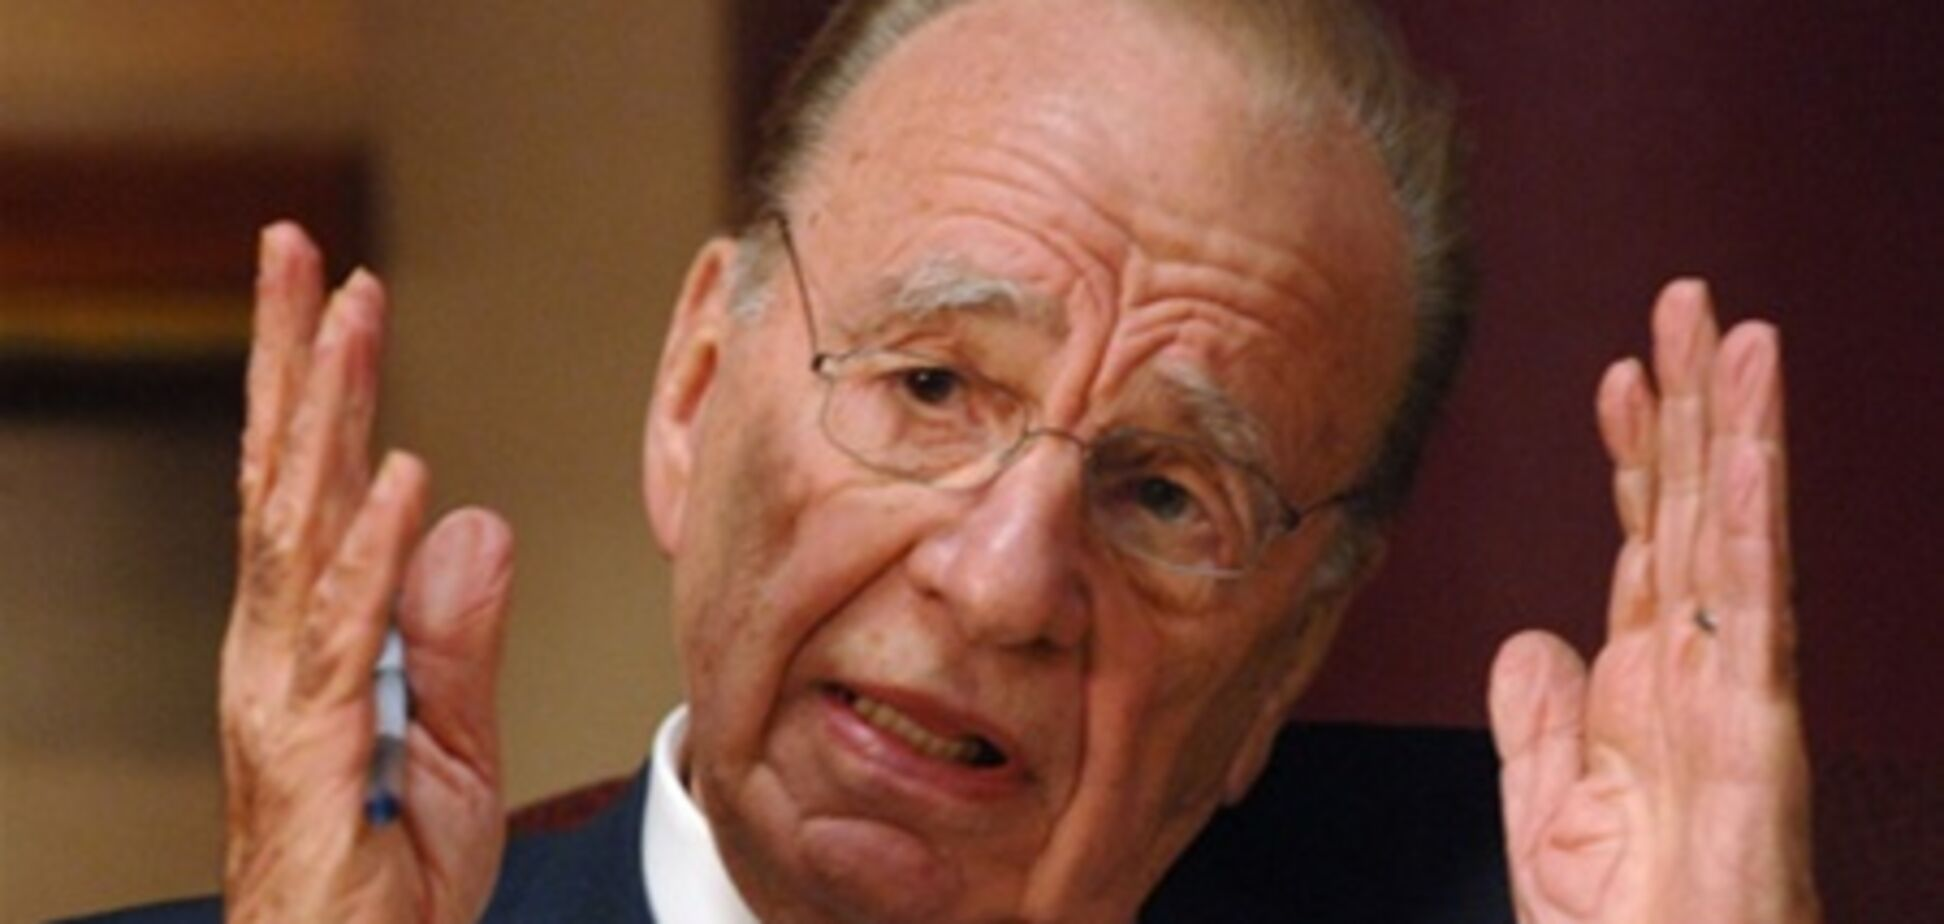 Мэрдок извинился за карикатуру на Нетаньяху